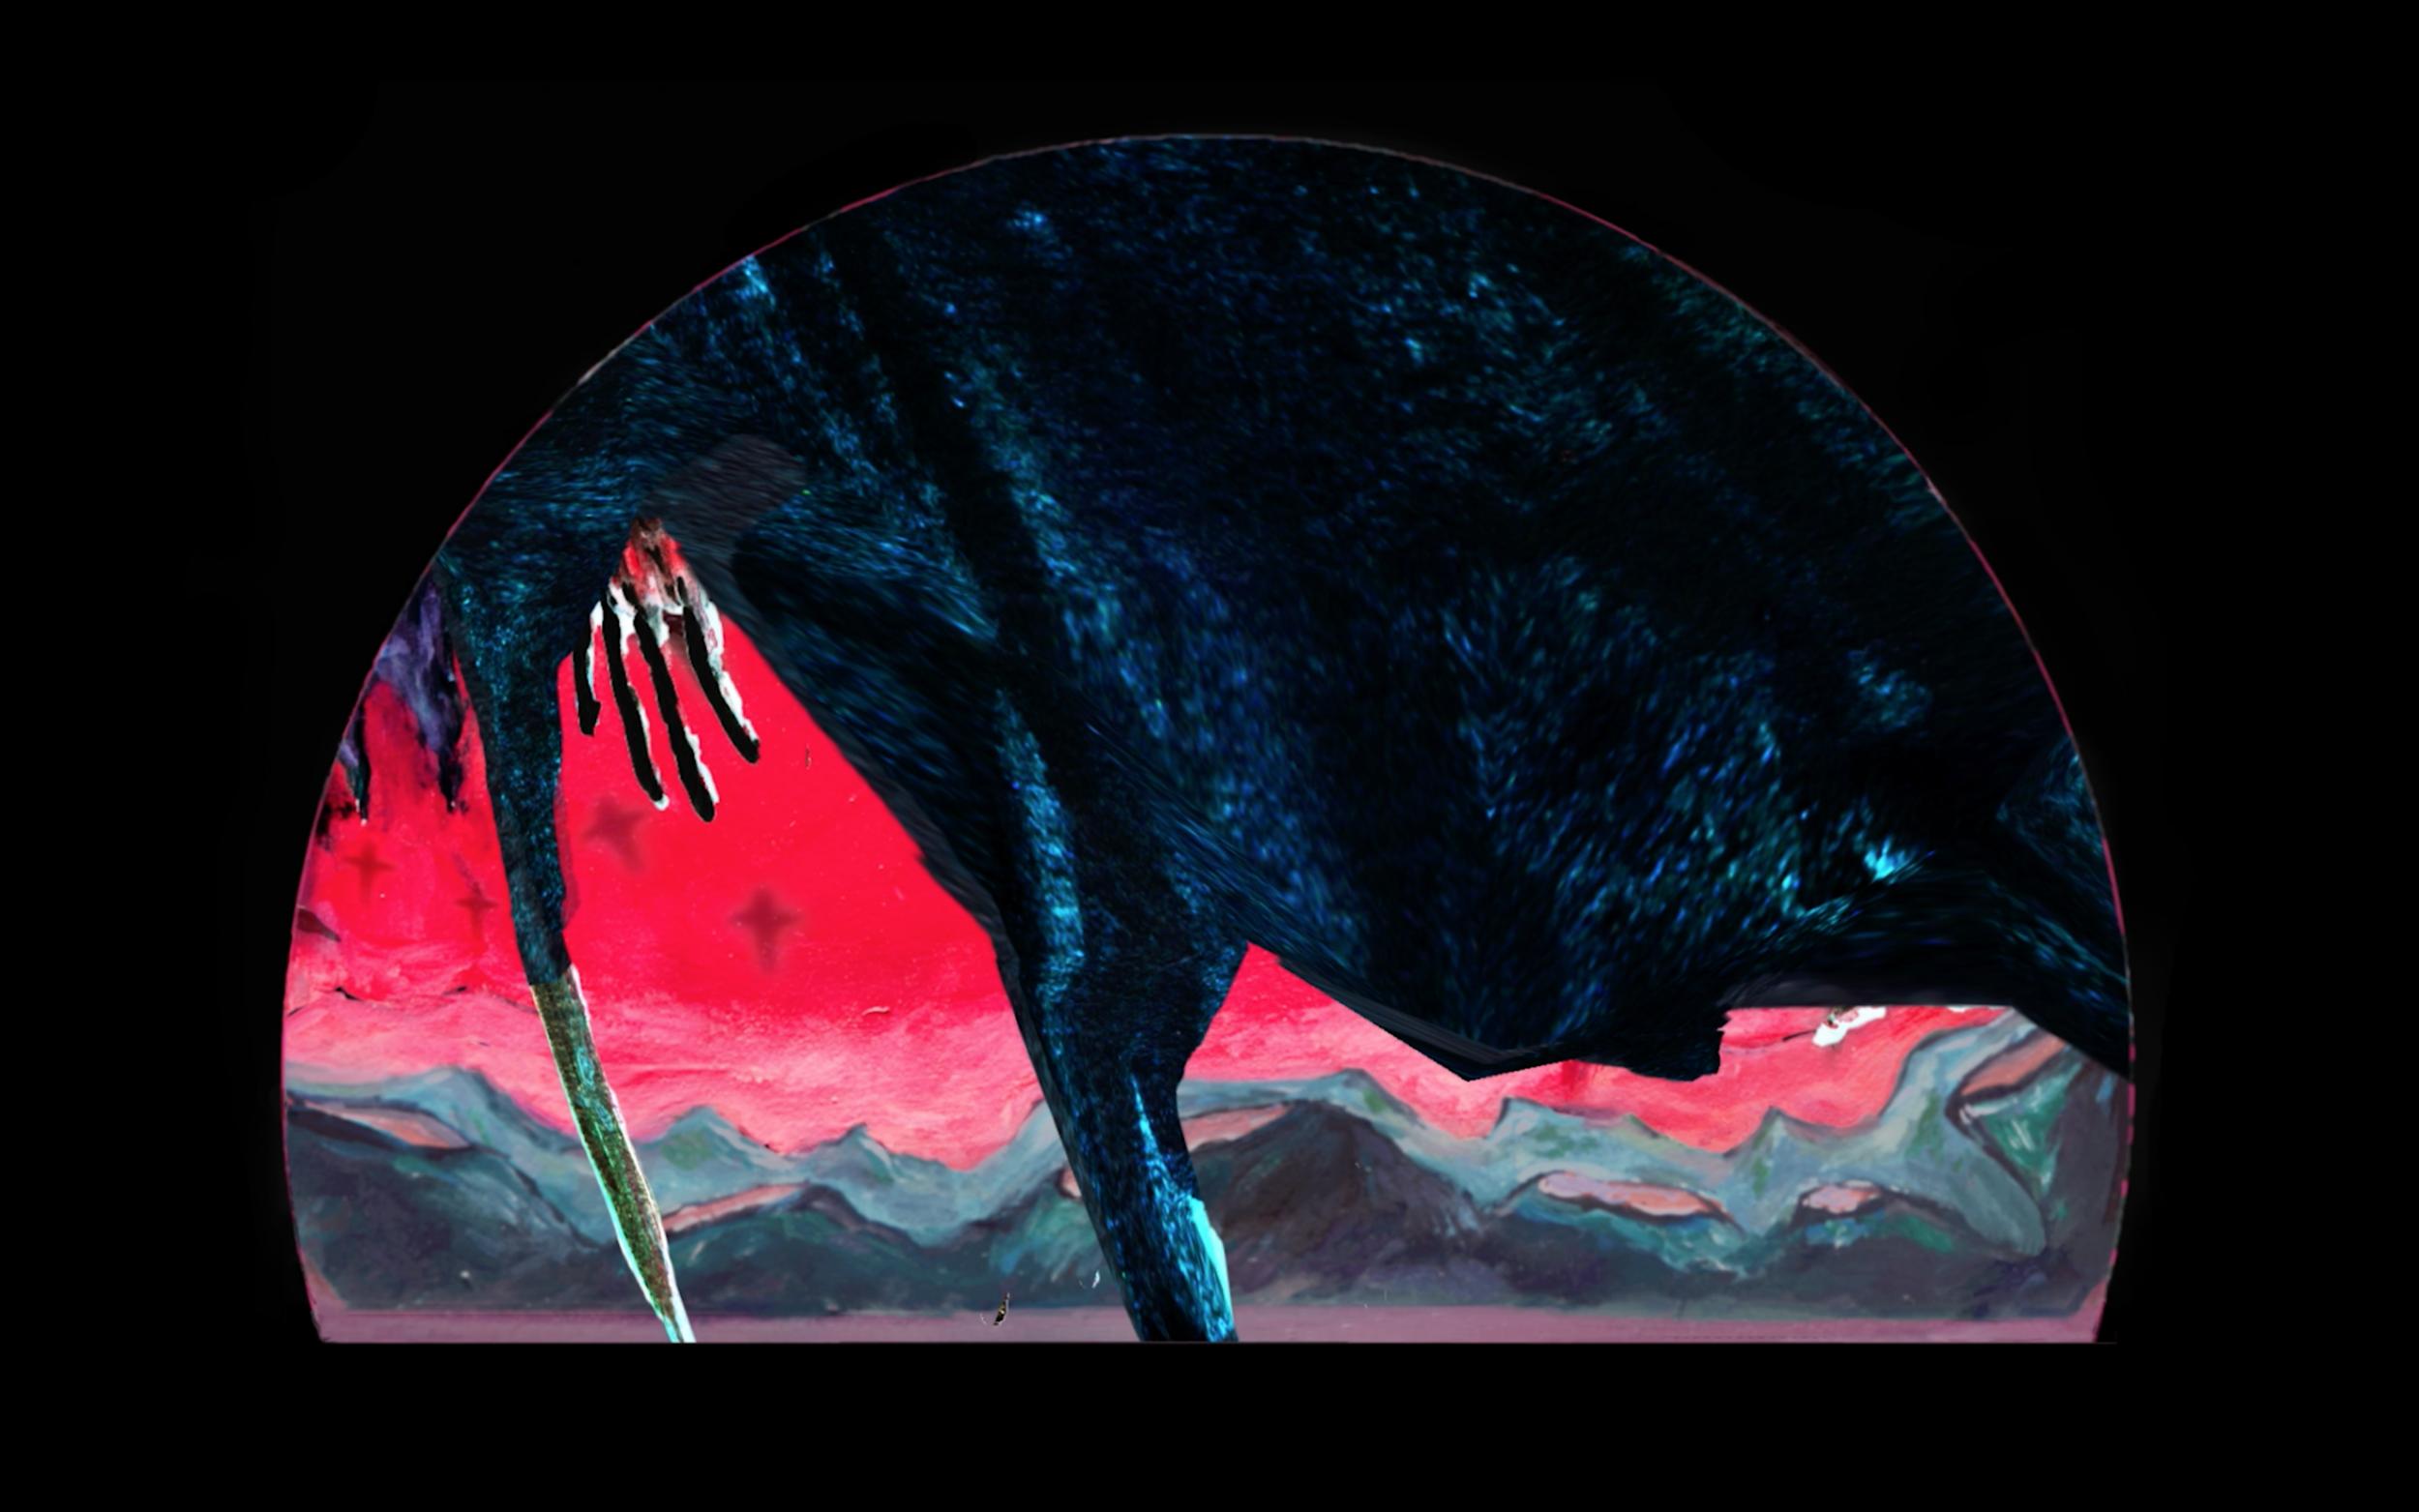 李泽易-红色 鸟 和 洞穴-4K动画-05:18''-2018(3).png